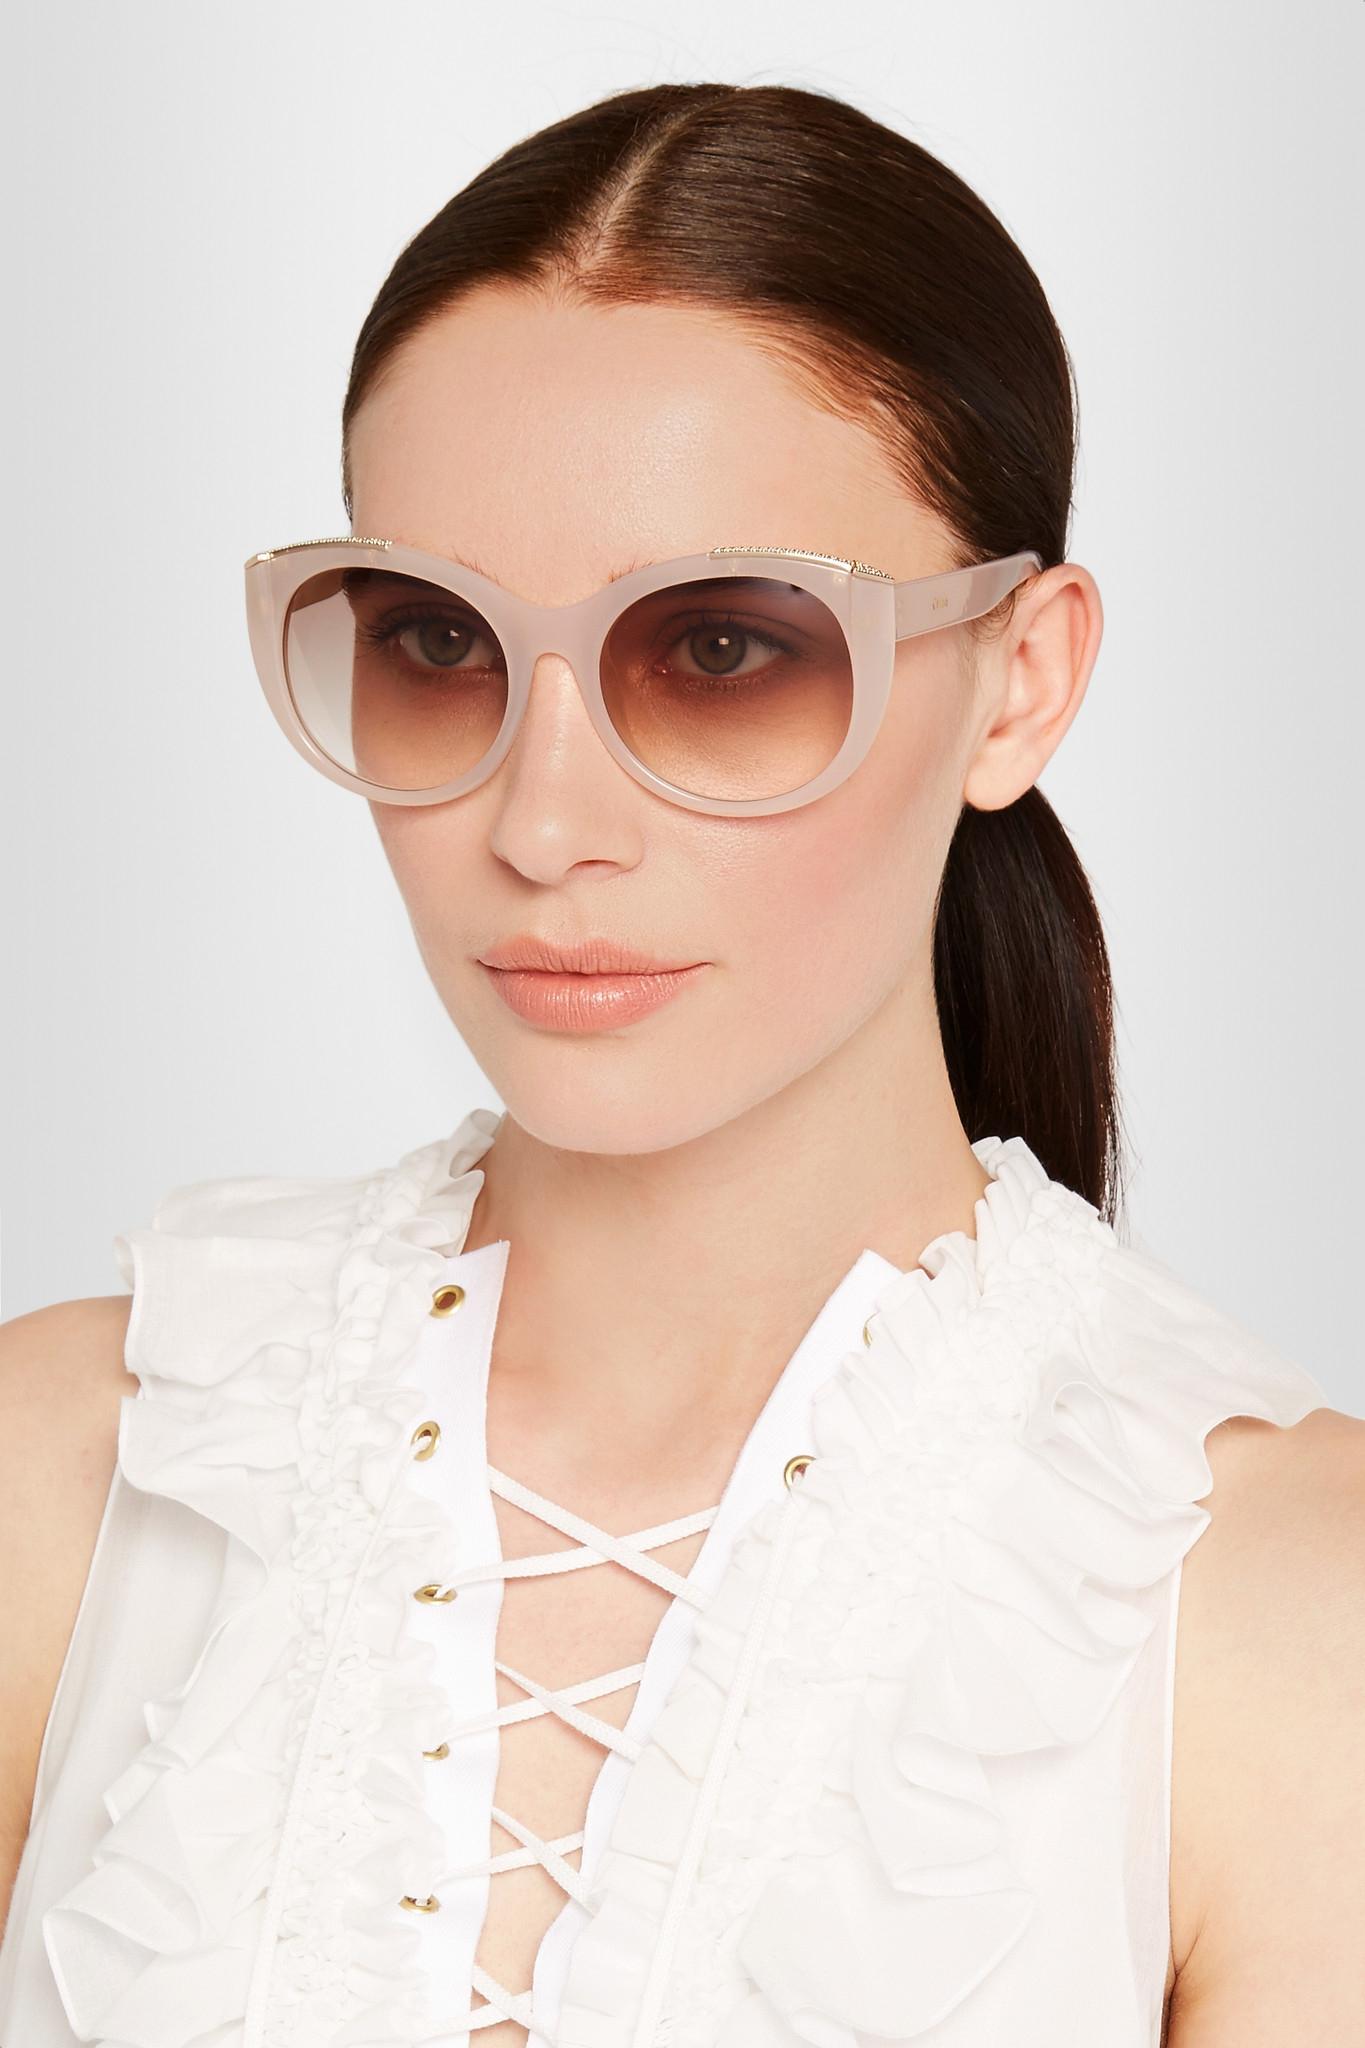 03997a54111 Chloe Style Round Sunglasses